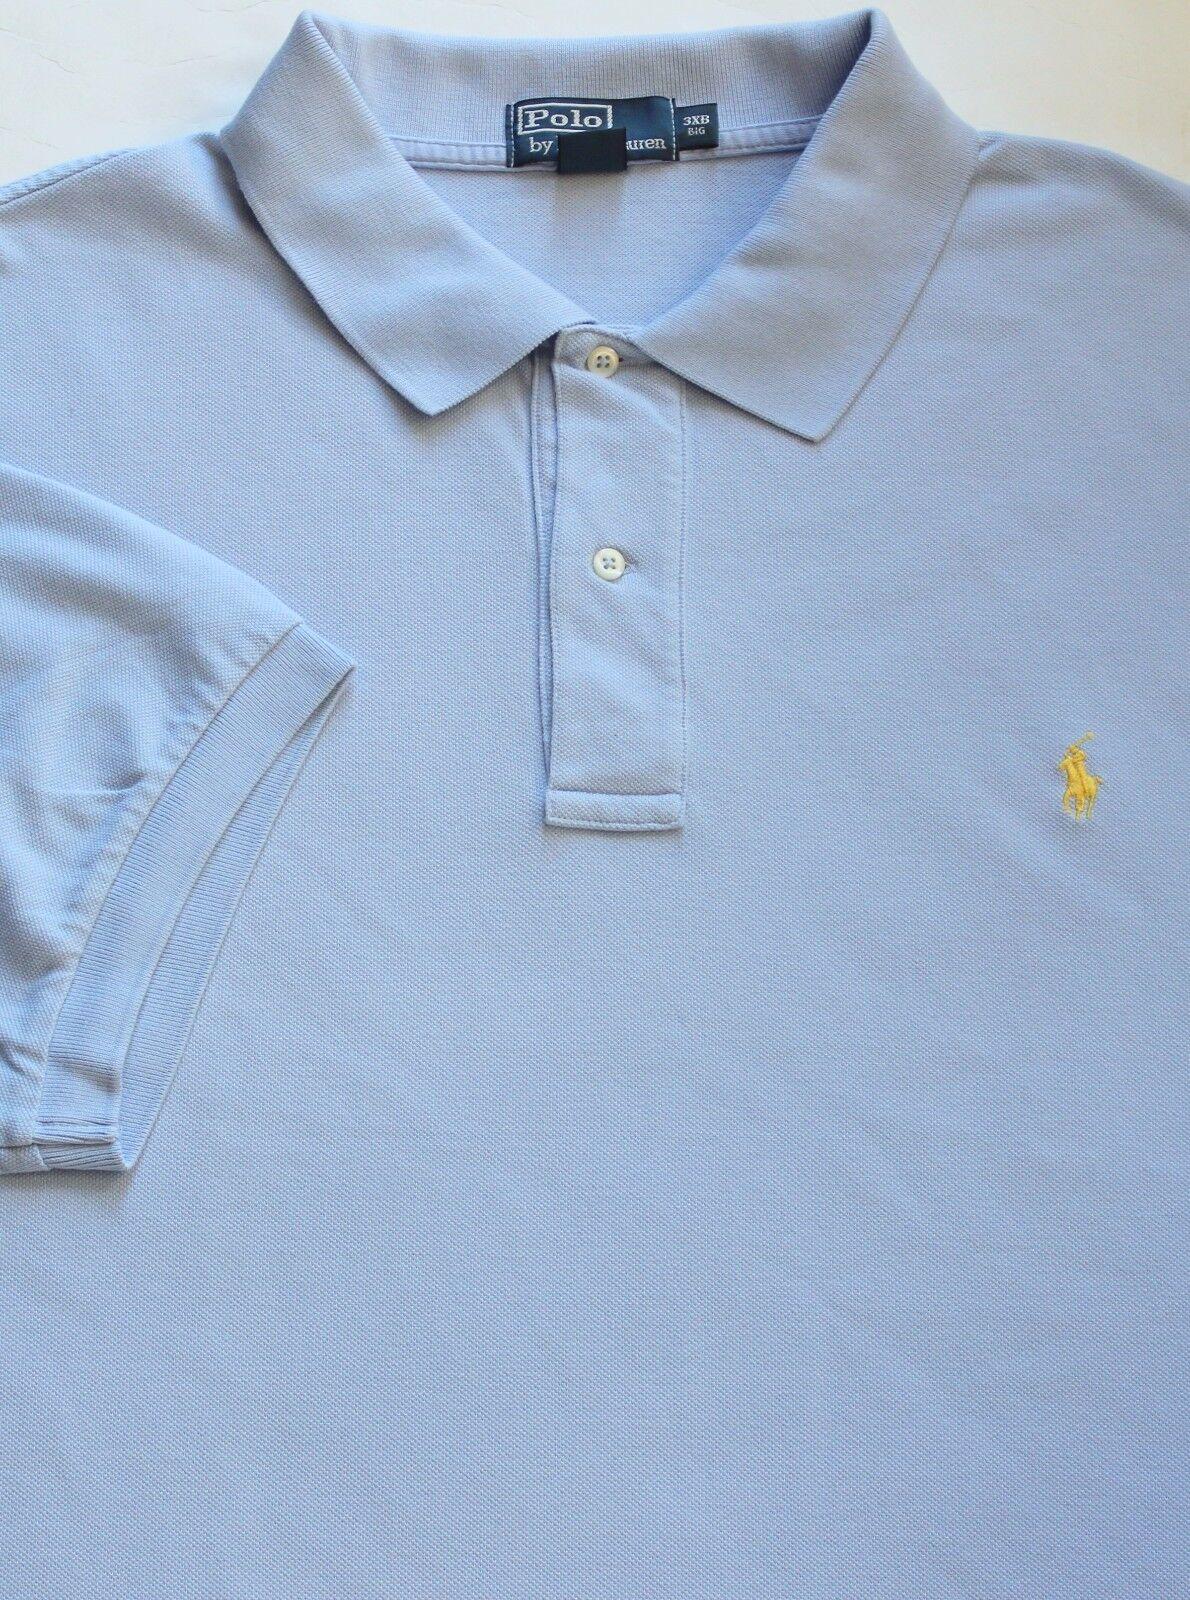 New Polo Ralph Lauren Winter bluee Cotton Mesh Polo Shirt   Big 3X